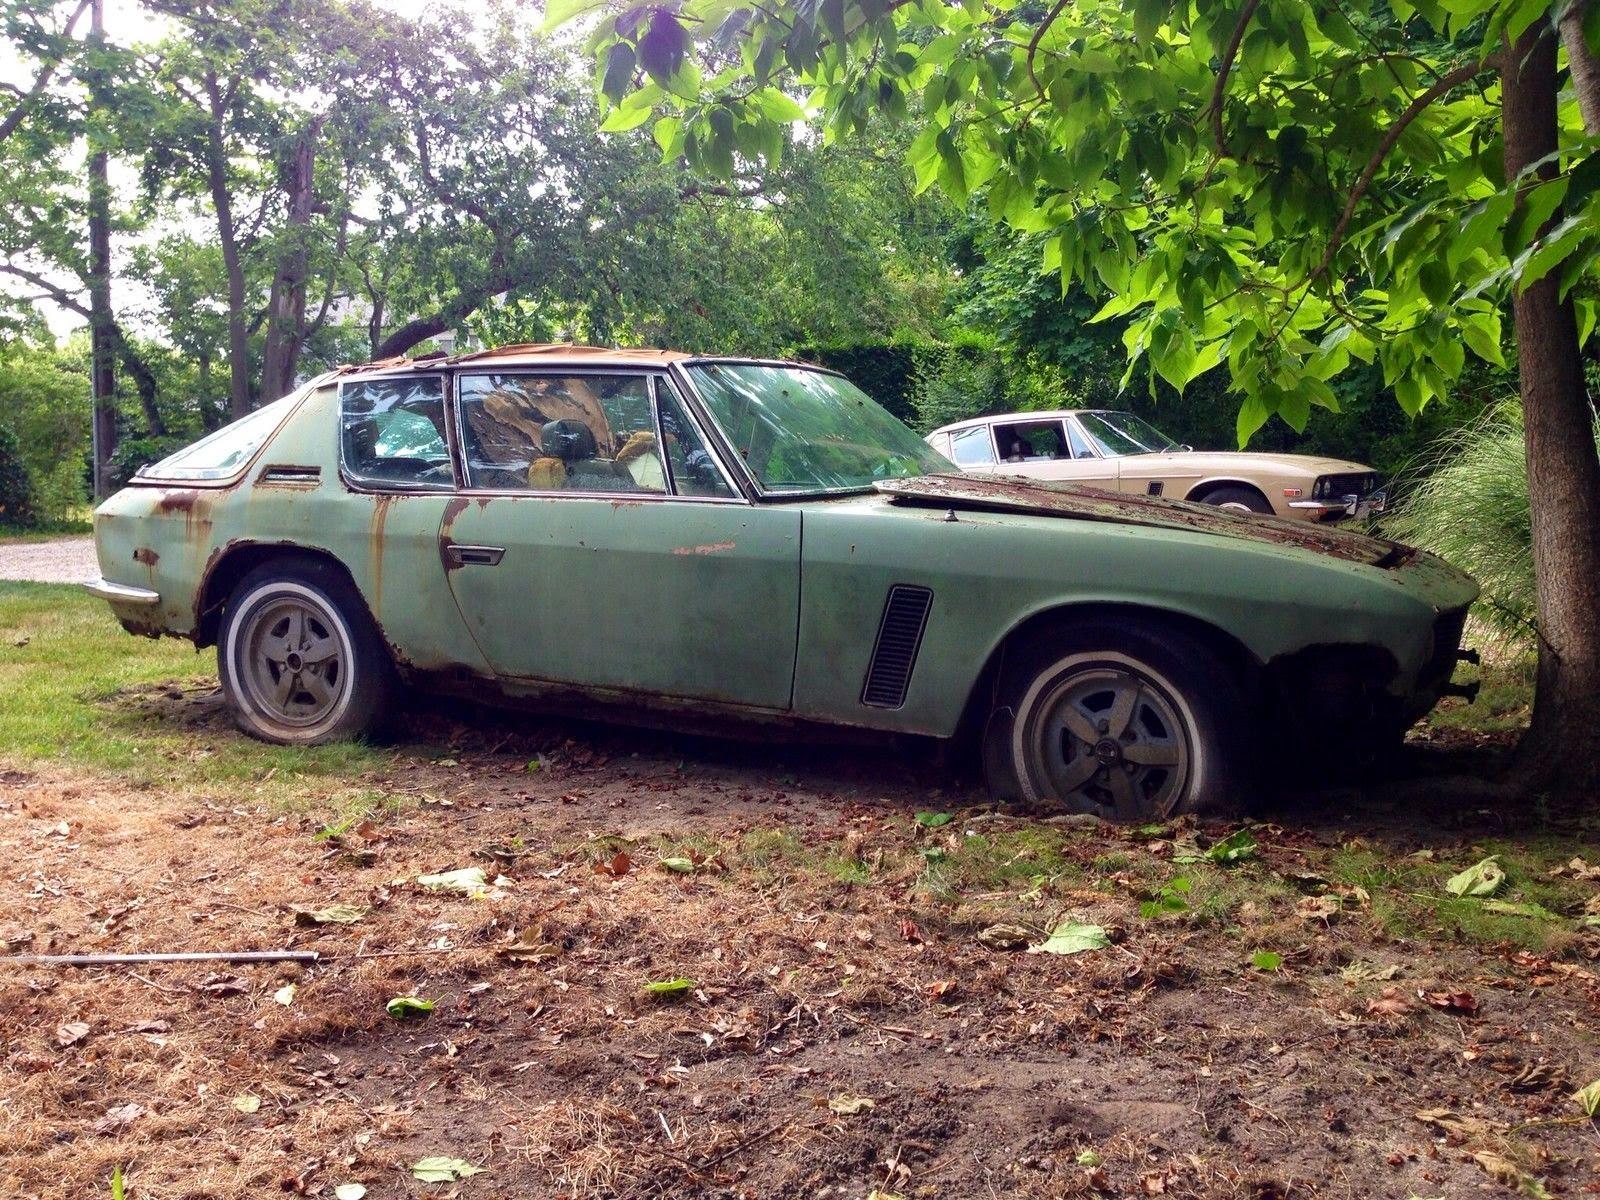 Restoration project cars 1972 jensen interceptor series 3 for American restoration cars for sale